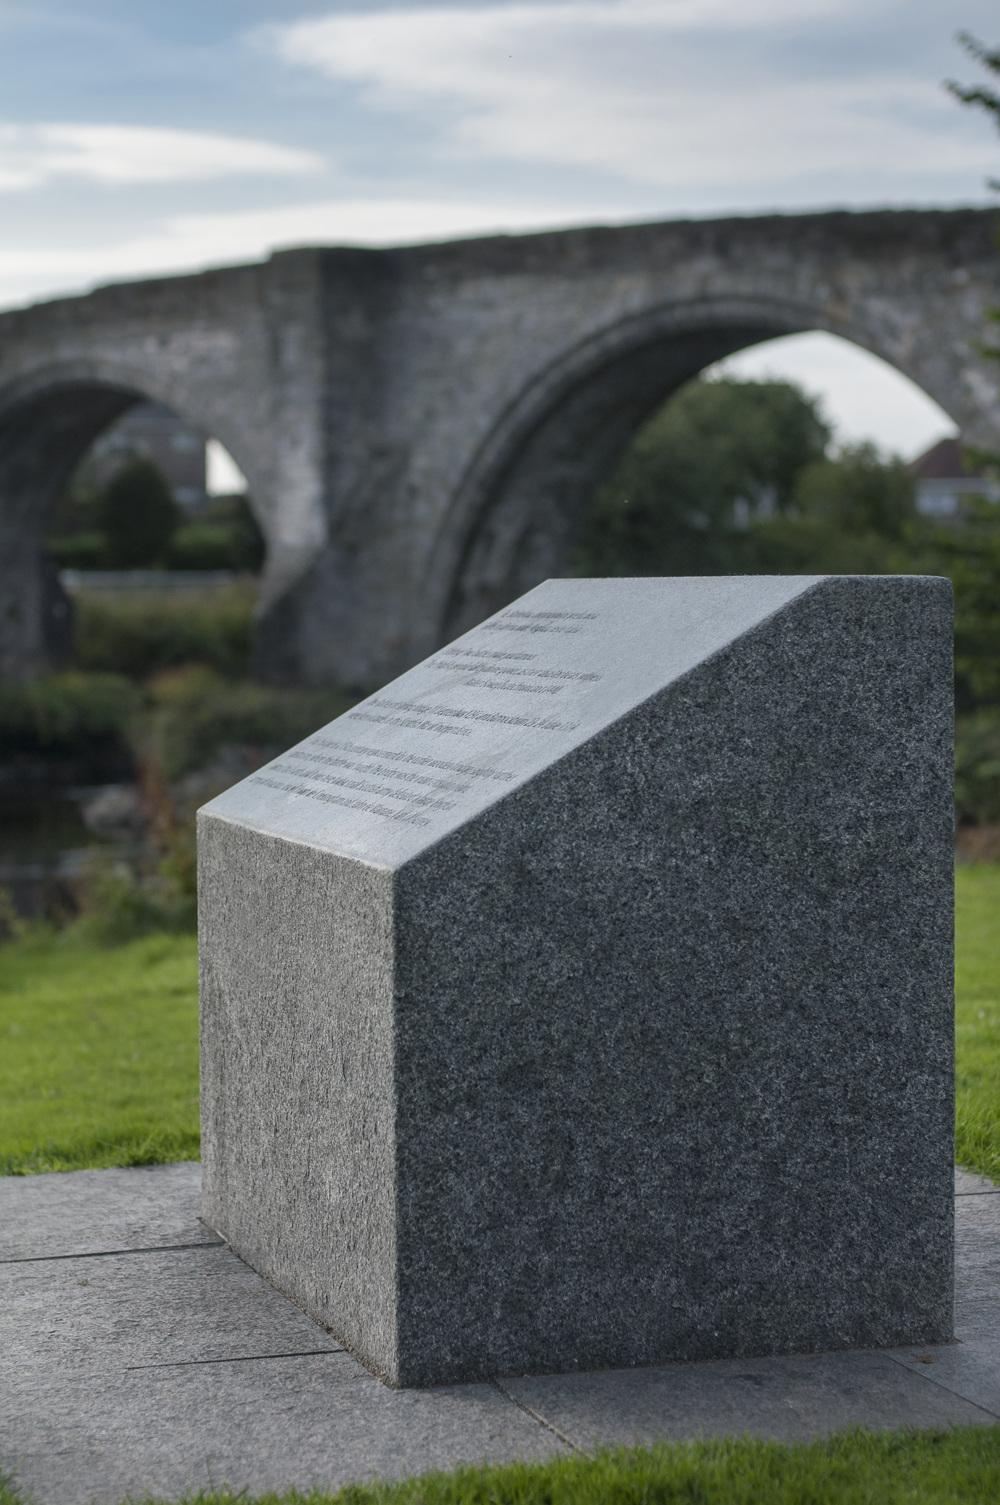 stirling.bridge.memorial.stone.historic.scottish.whin.heritage.stone.suppliers.tradstocks.glasgow.jpg